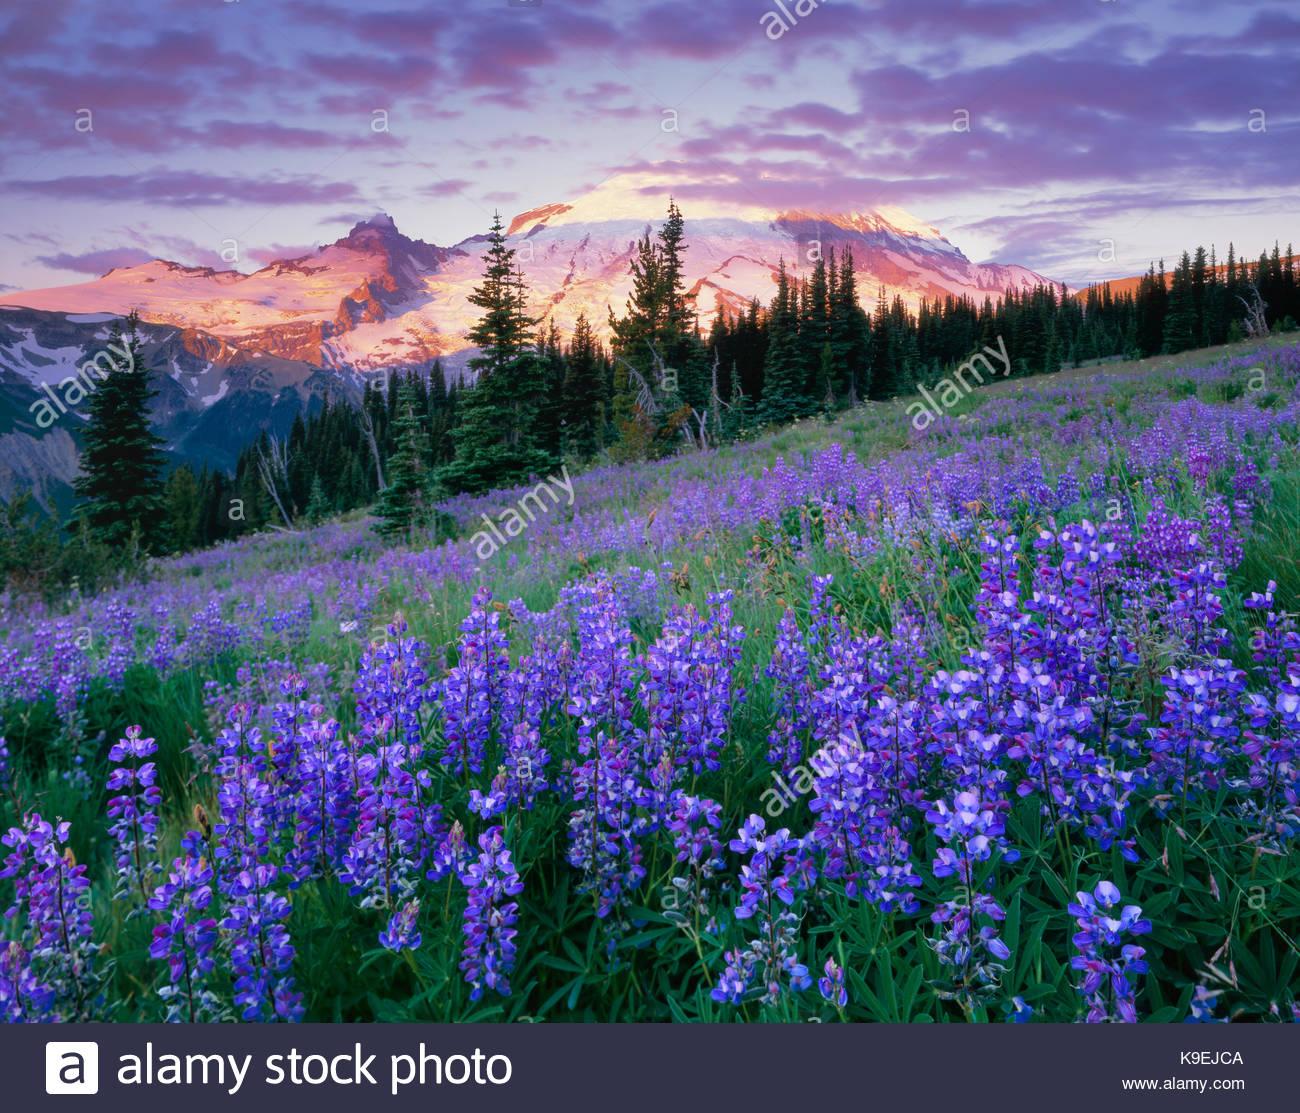 Lupine and Mount Rainier at Sunrise, Mount Rainier National Park, Washington - Stock Image